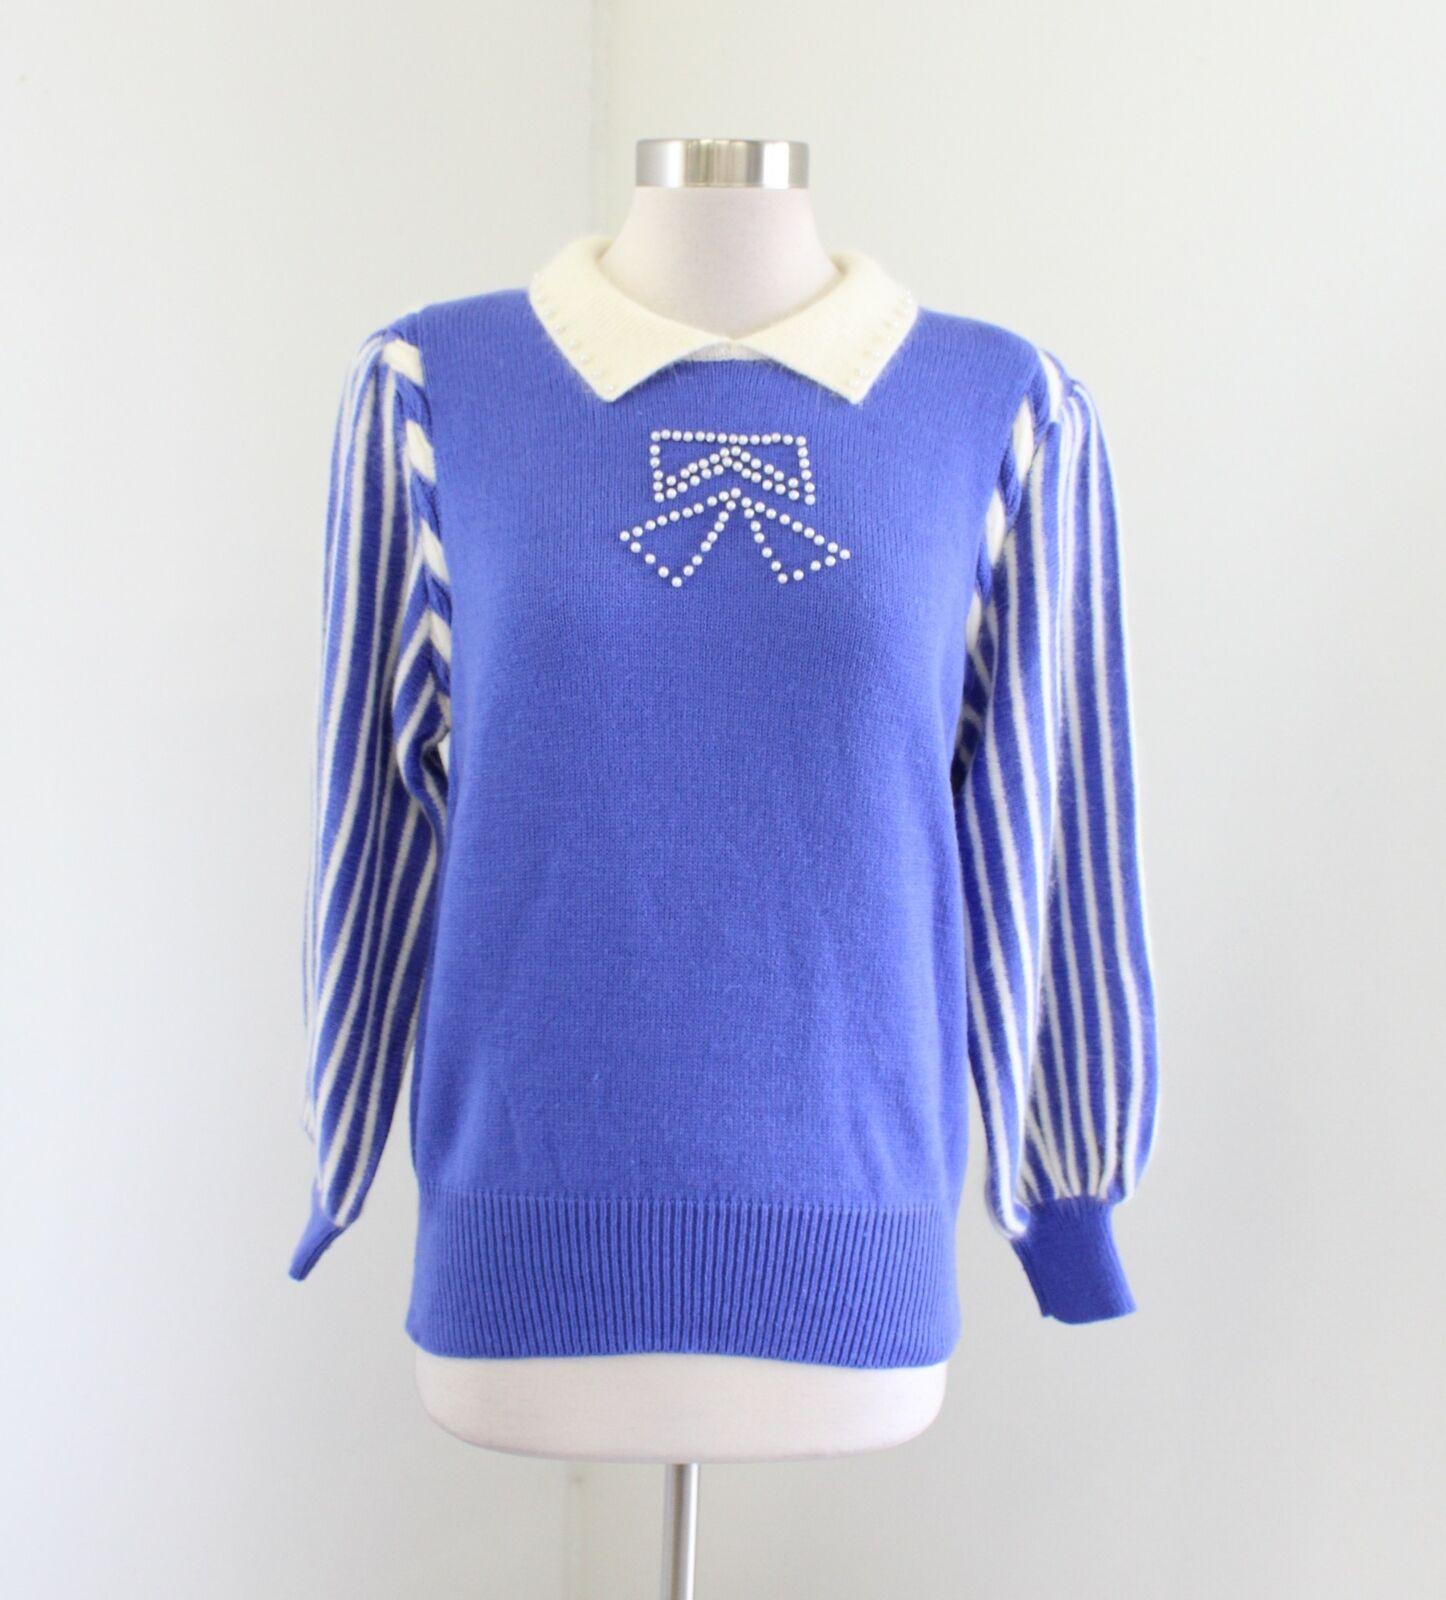 NWT Vtg 90s bluee Purple Cream Bow Pearl Beaded Angora Wool Sweater Size M Retro